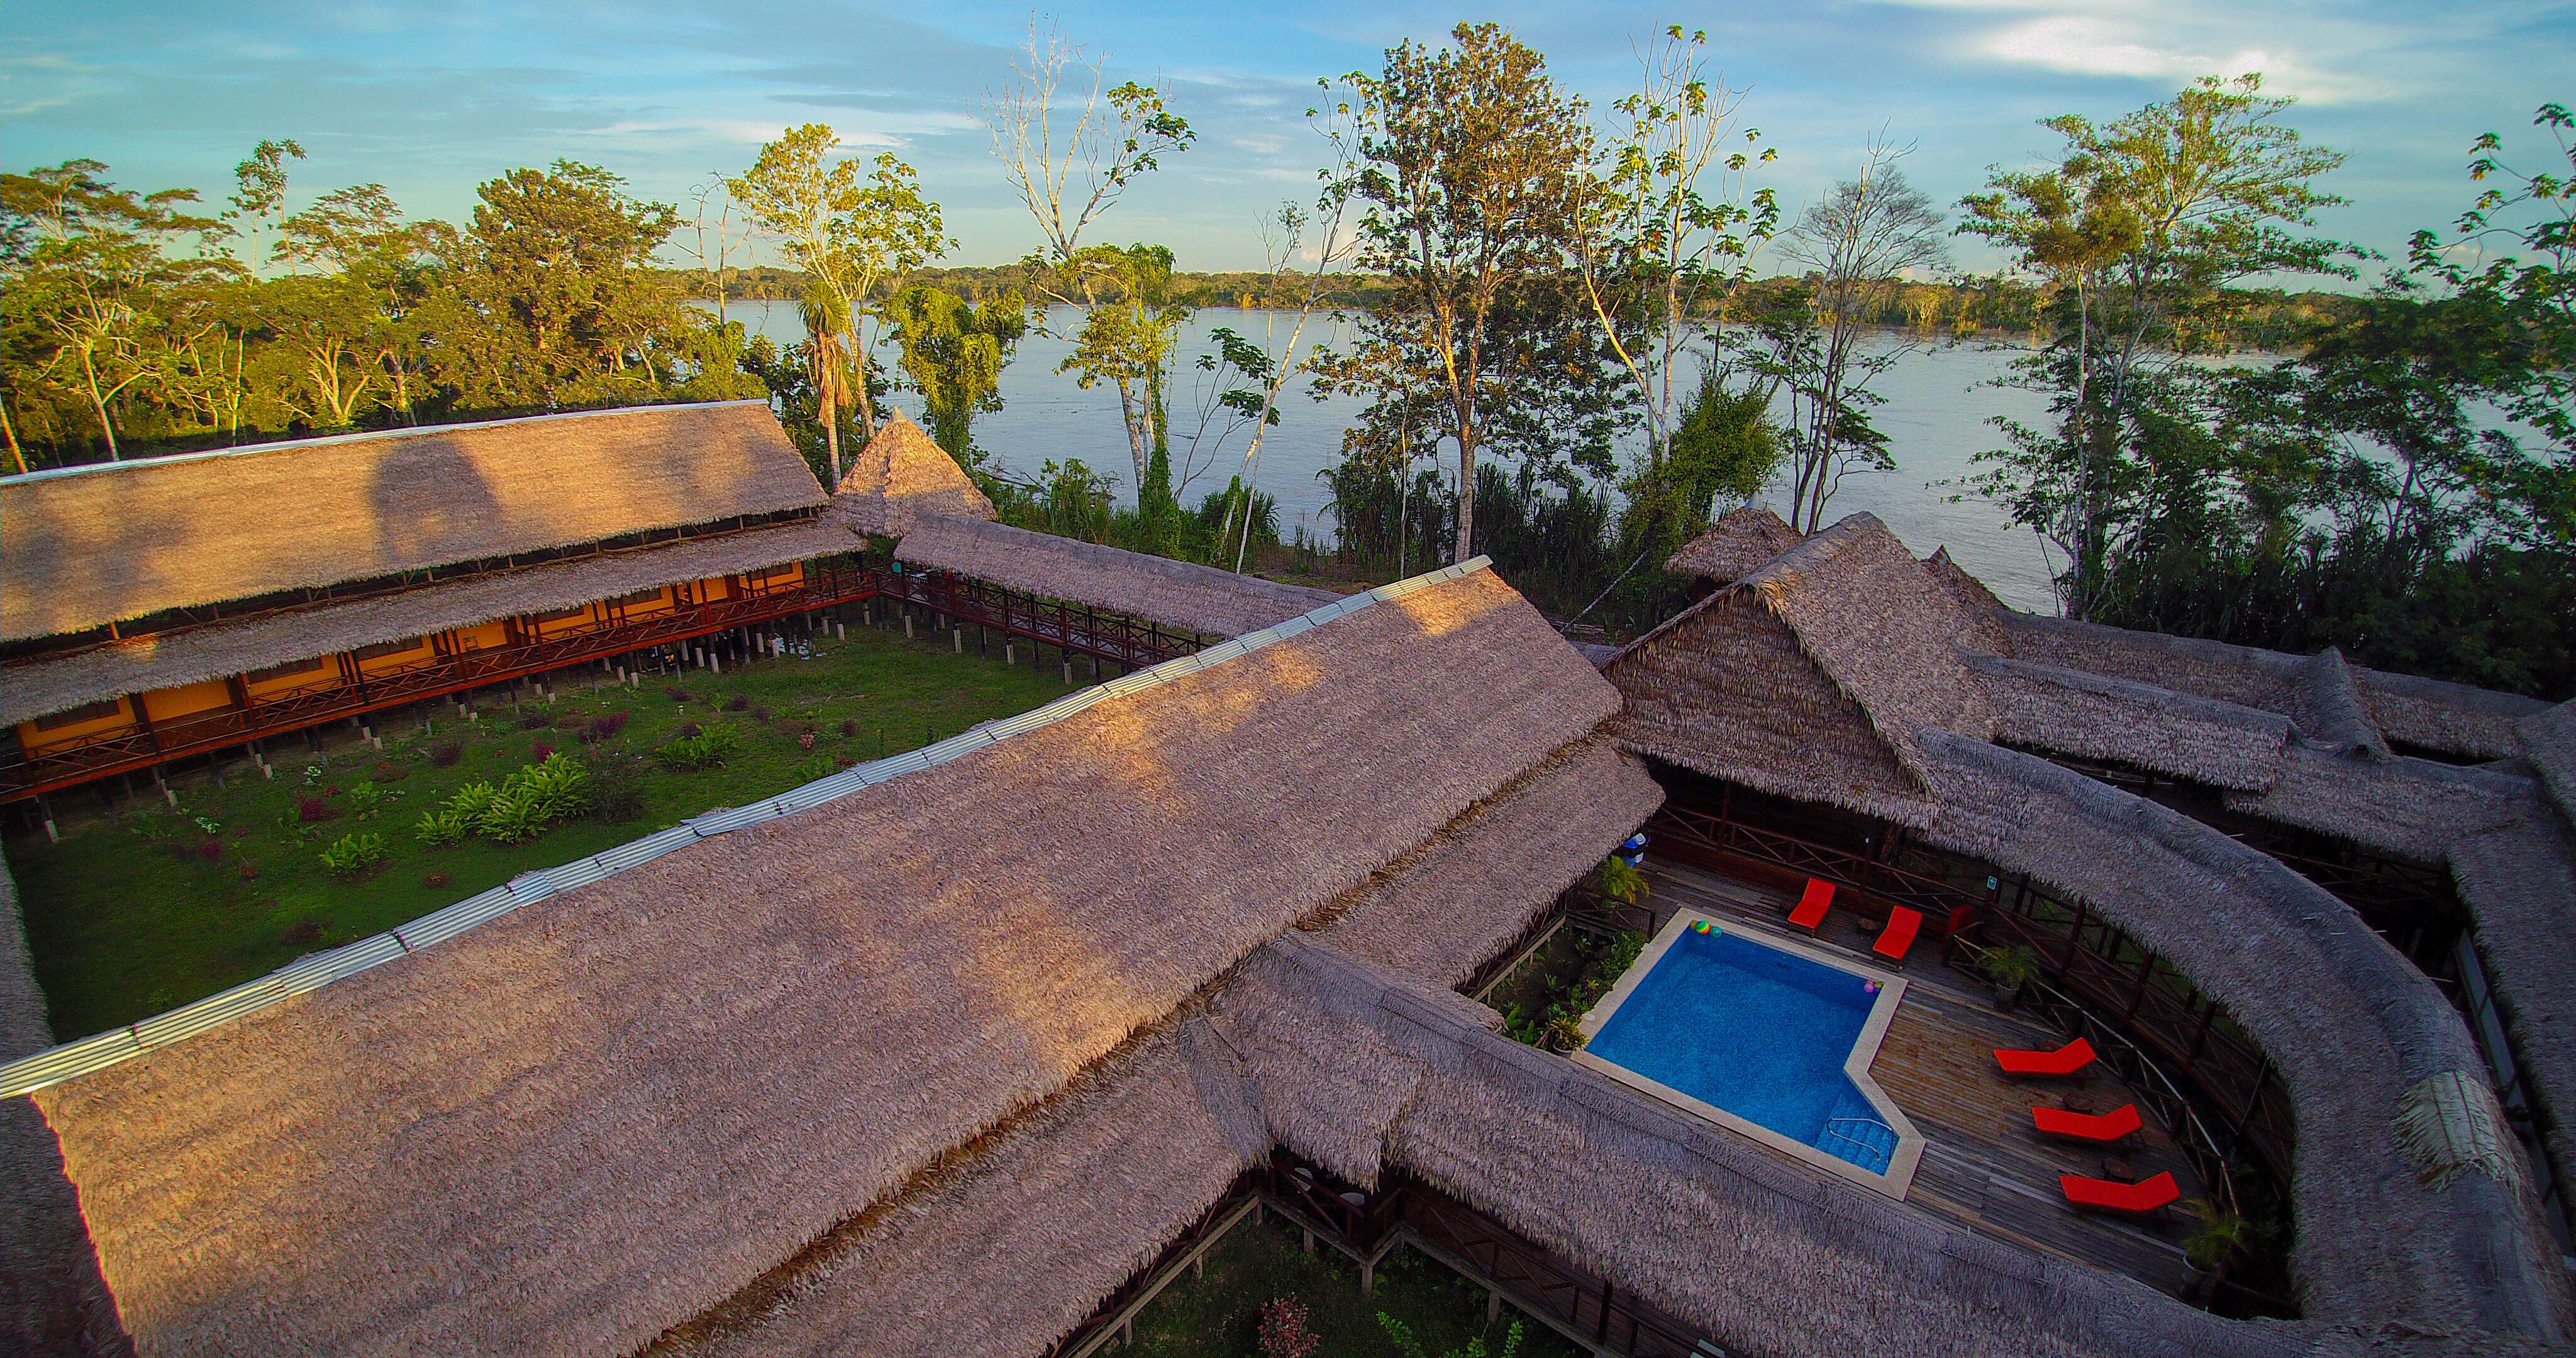 Heliconia Amazon River Lodge, Maynas